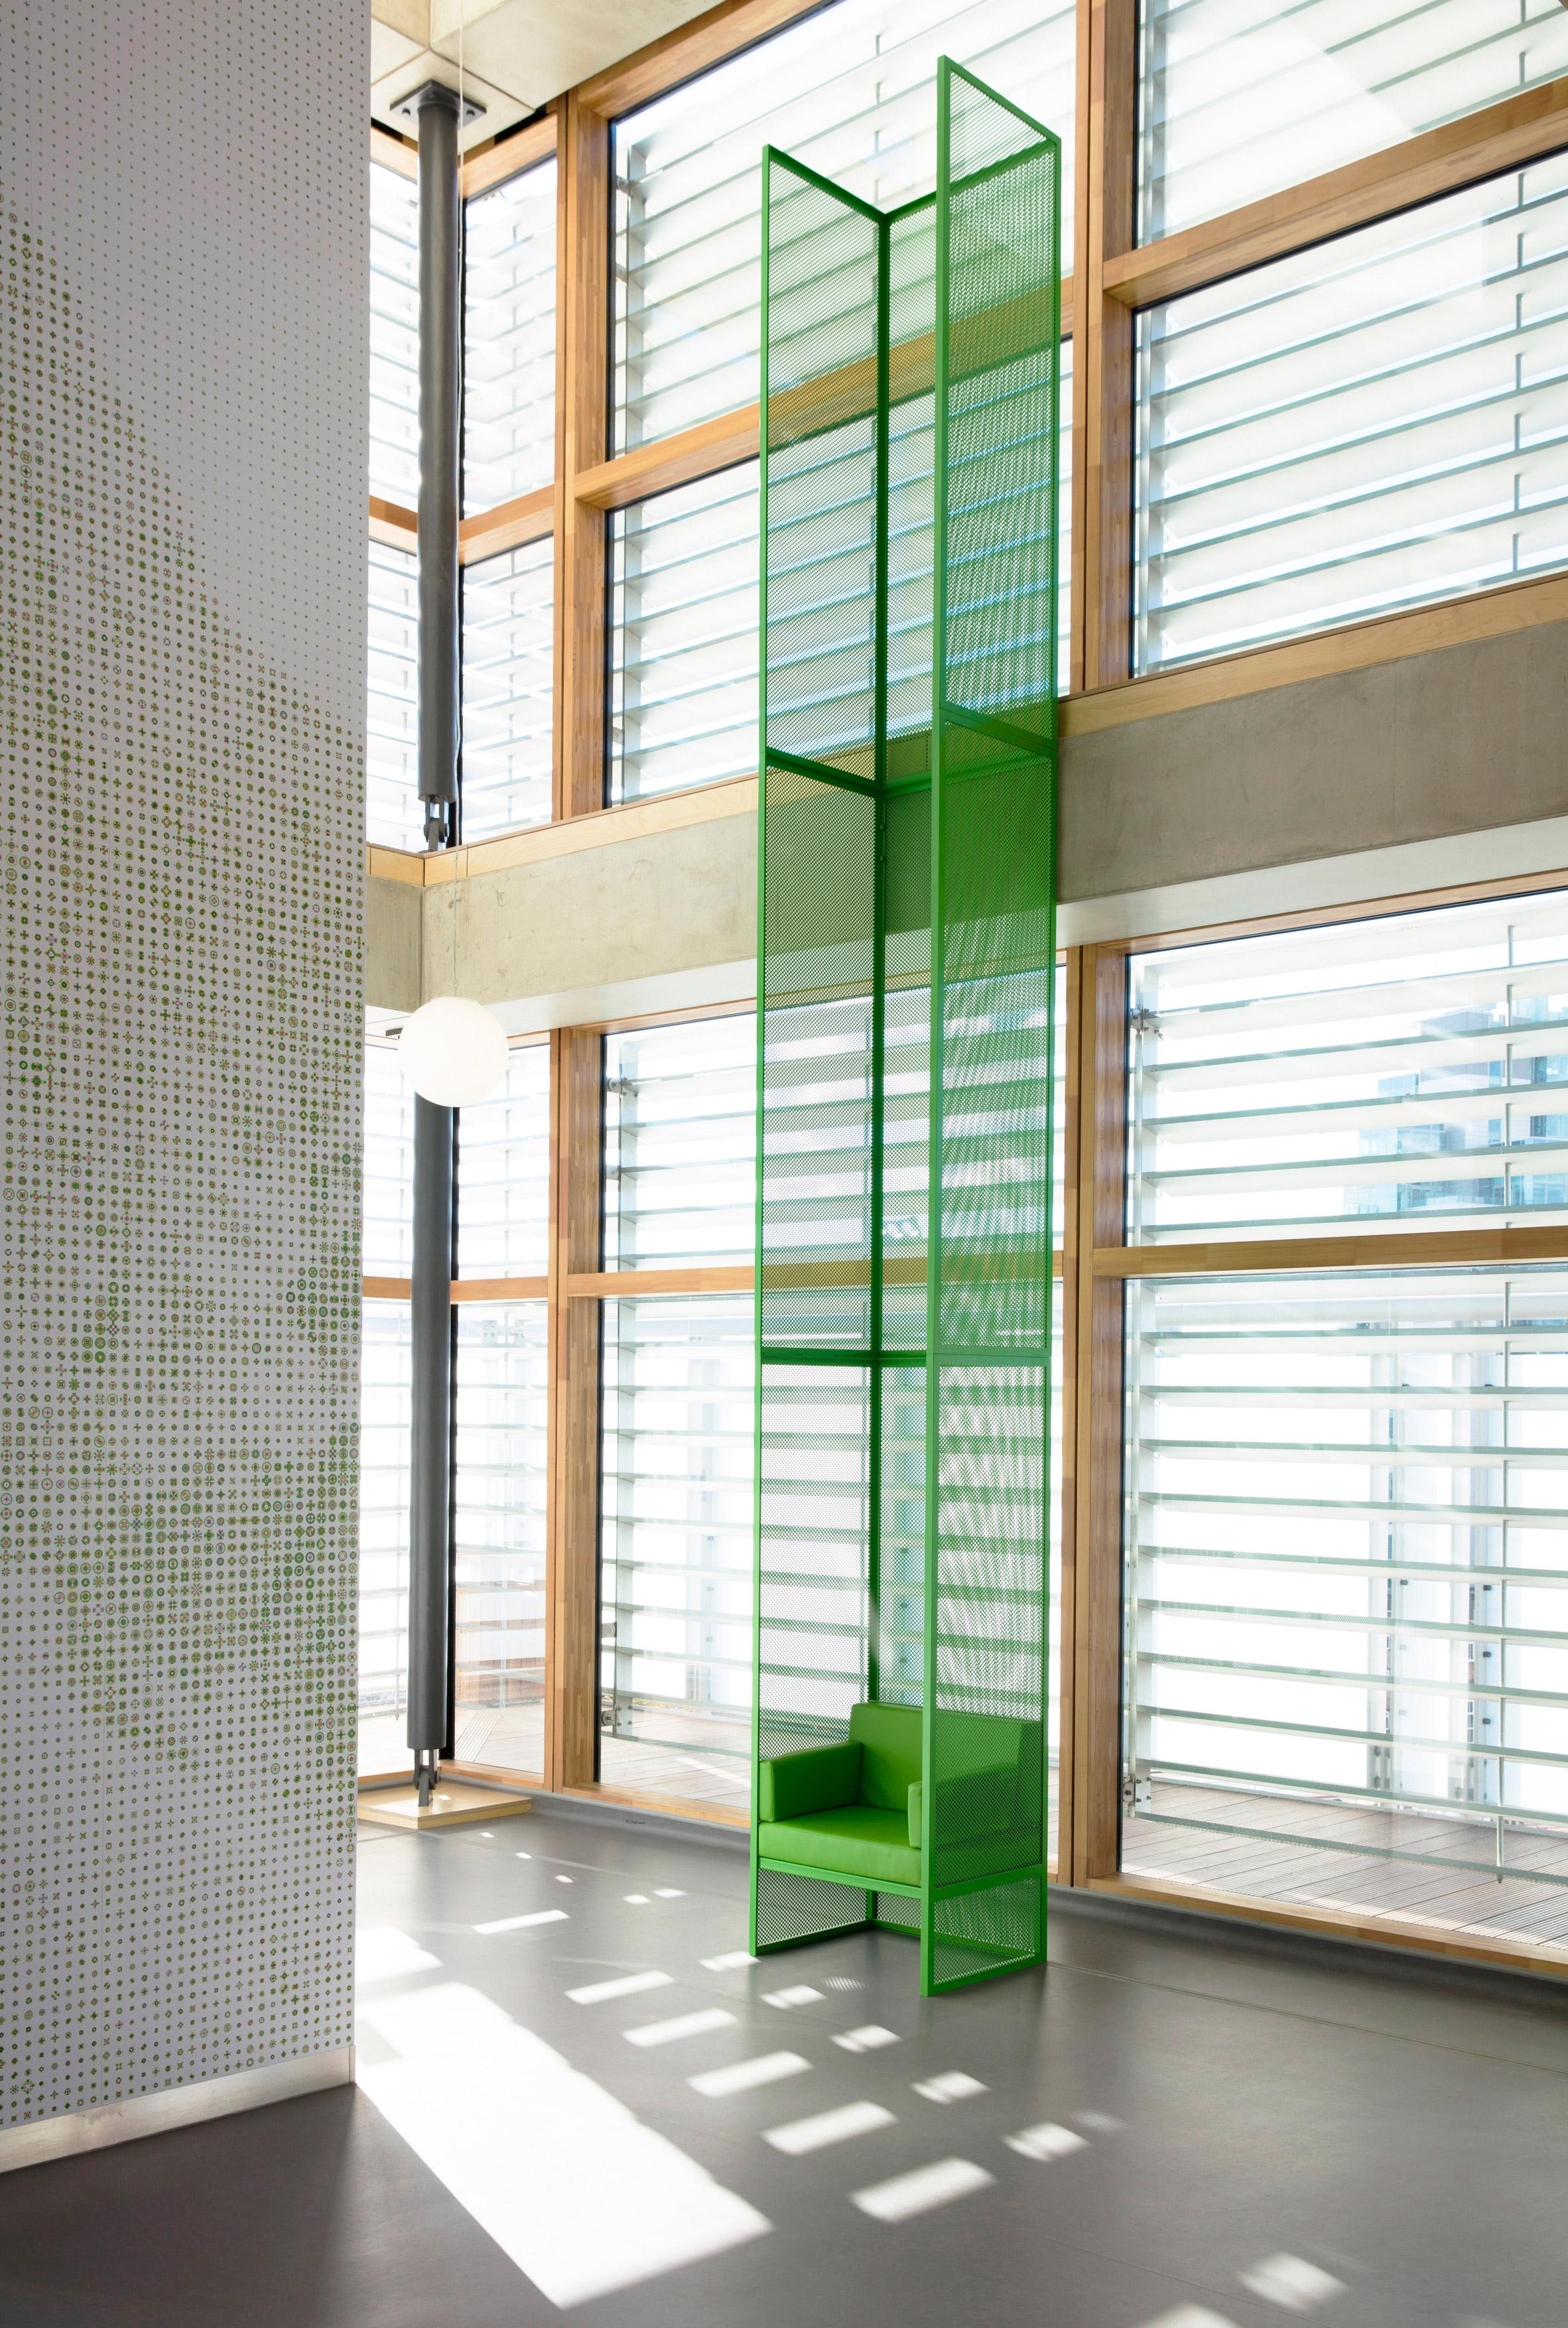 guys-cancer-centre-interiors-london-bridge-uk-gitta-gschwendtner_dezeen_2364_col_6